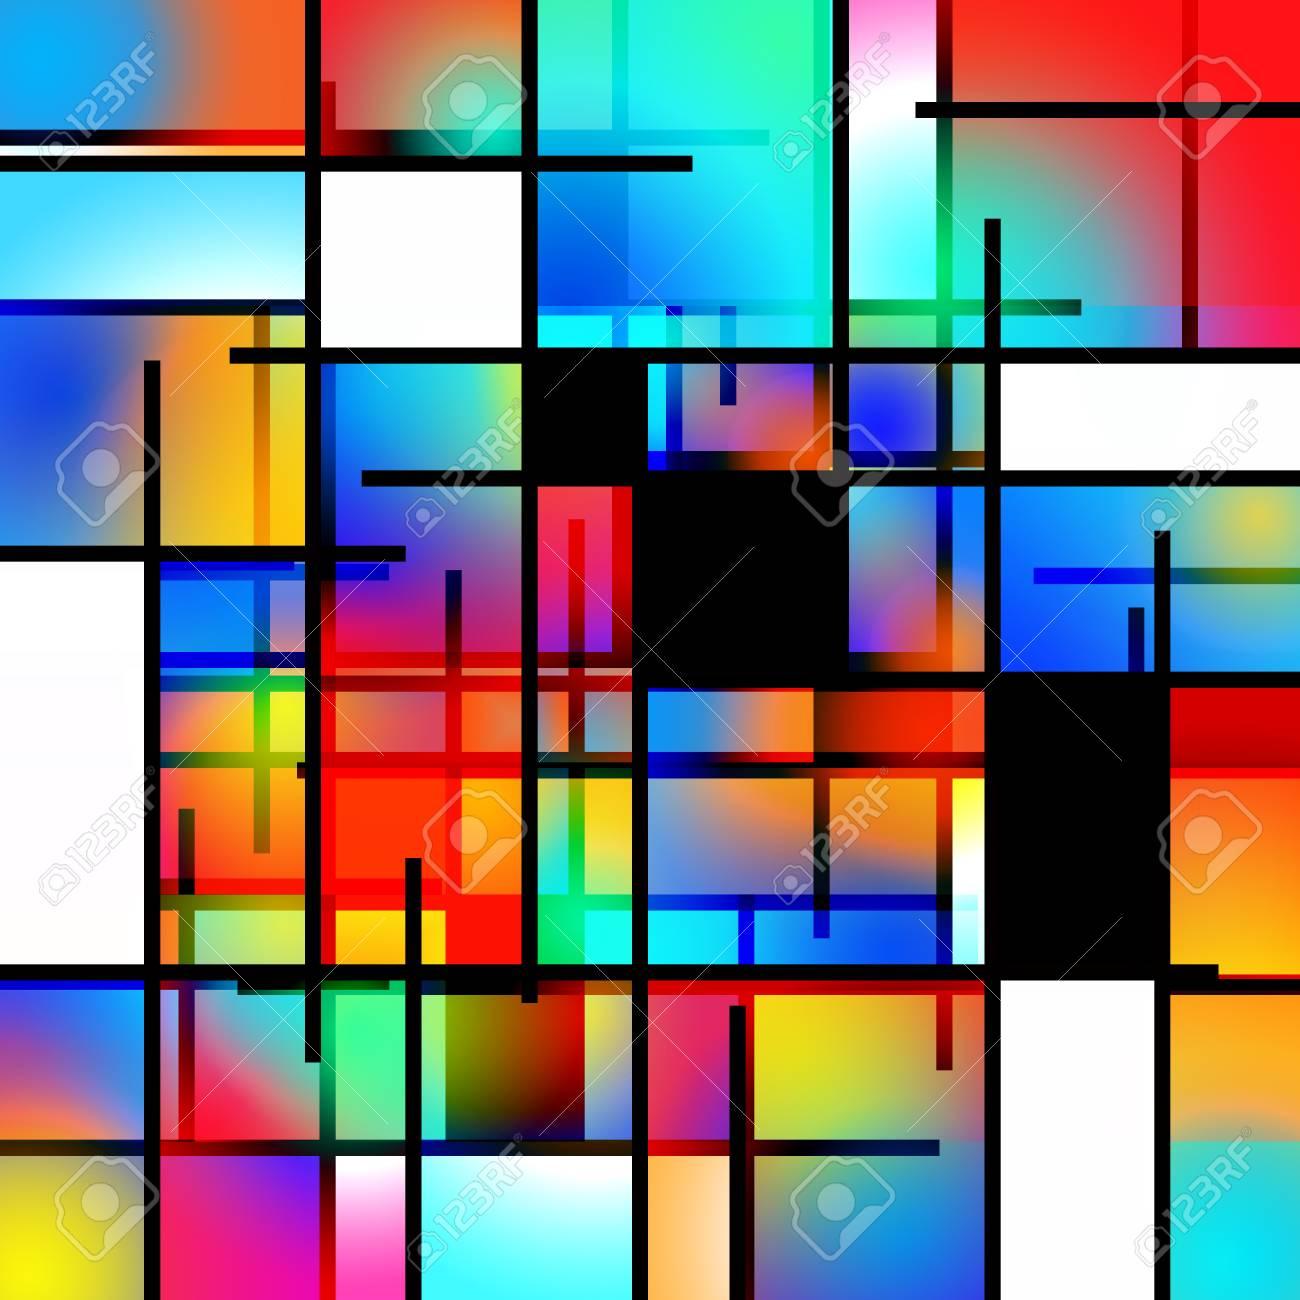 Colorful Geometric Background Mondrian Inspired Stock Photo 1300x1300